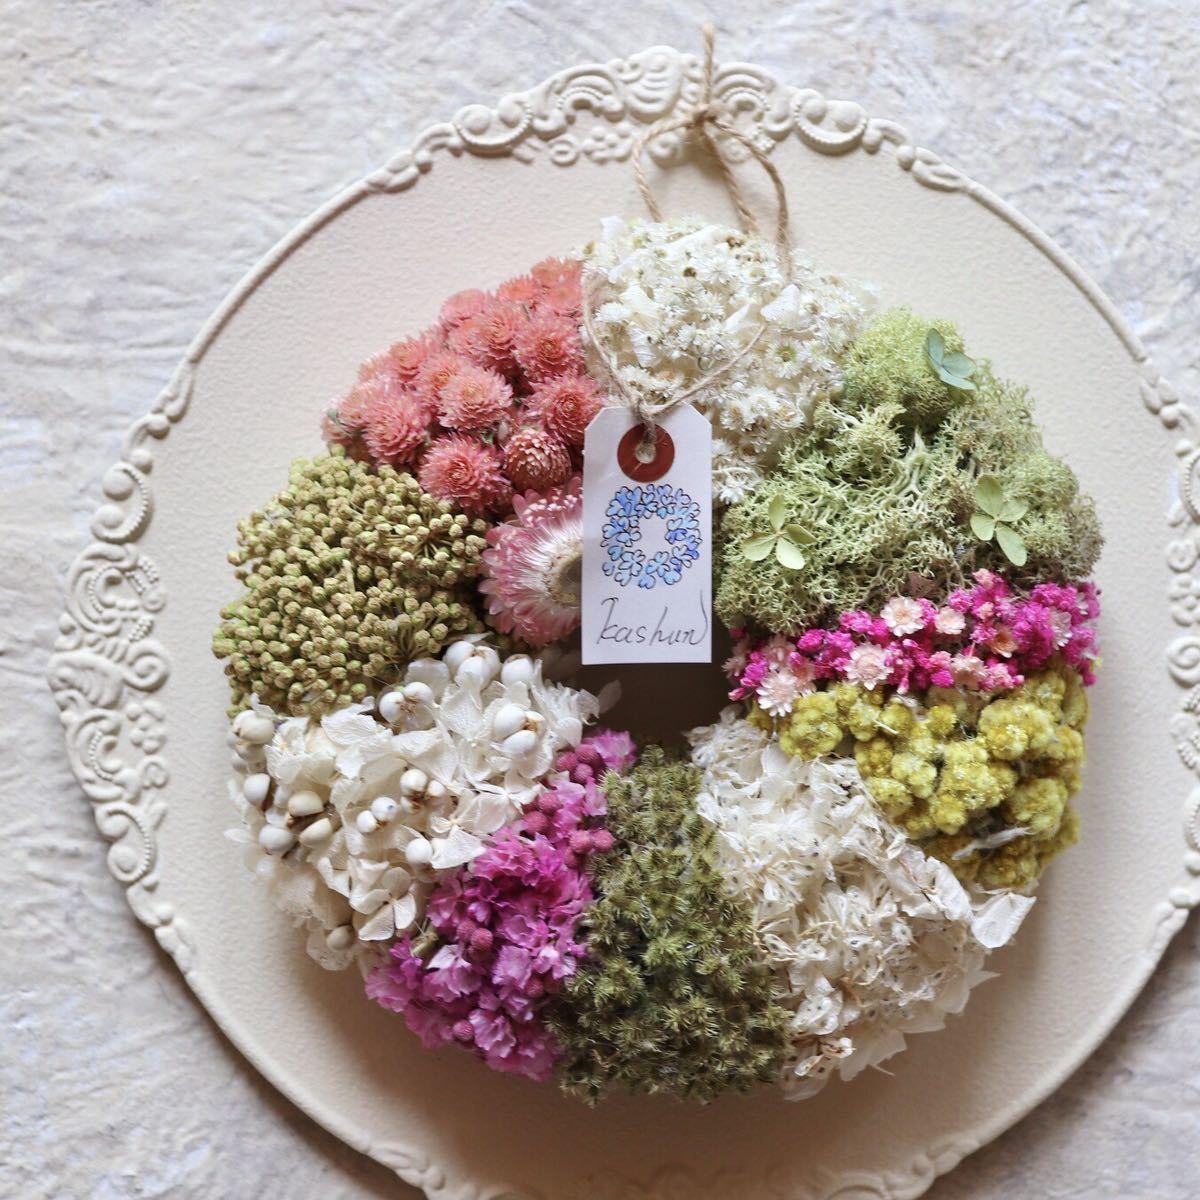 *kashun* (20cm)ハンドメイド コロンと丸いお菓子みたいなピンクのリース /ドライフラワー/壁飾り/誕生日プレゼント/お祝い/ギフト_画像6